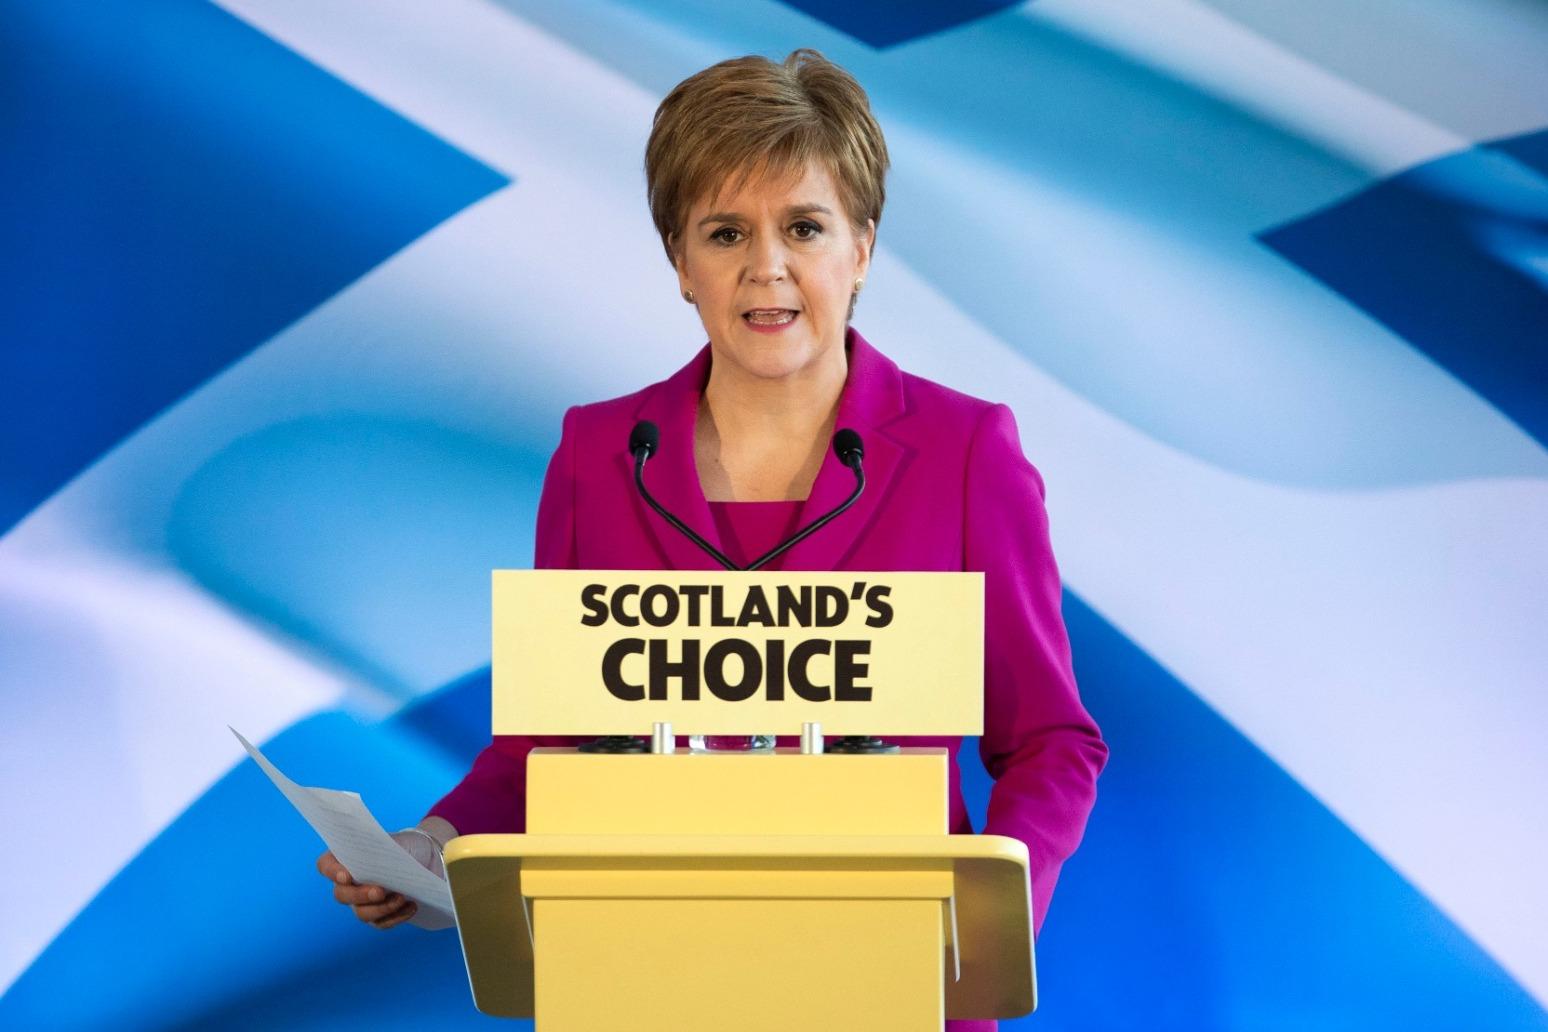 NICOLA STURGEON WARNS \'DEMOCRACY WILL PREVAIL\' AS SHE DEMANDS INDYREF2